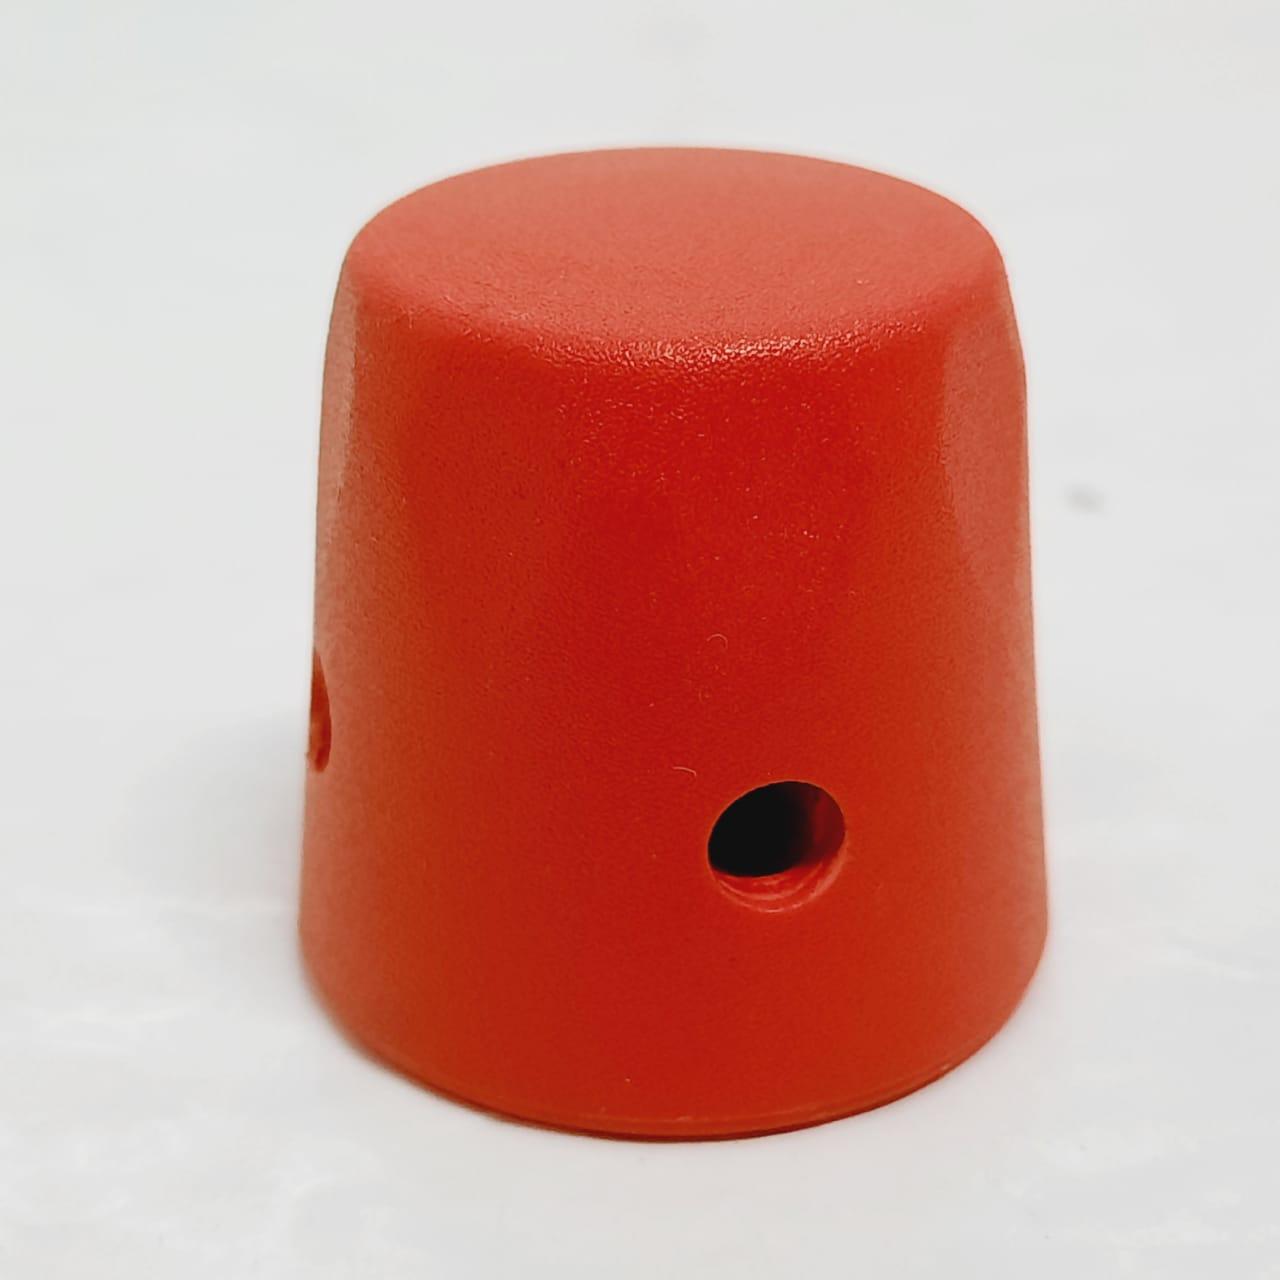 Peso Universal Capa Vermelha (10UN)